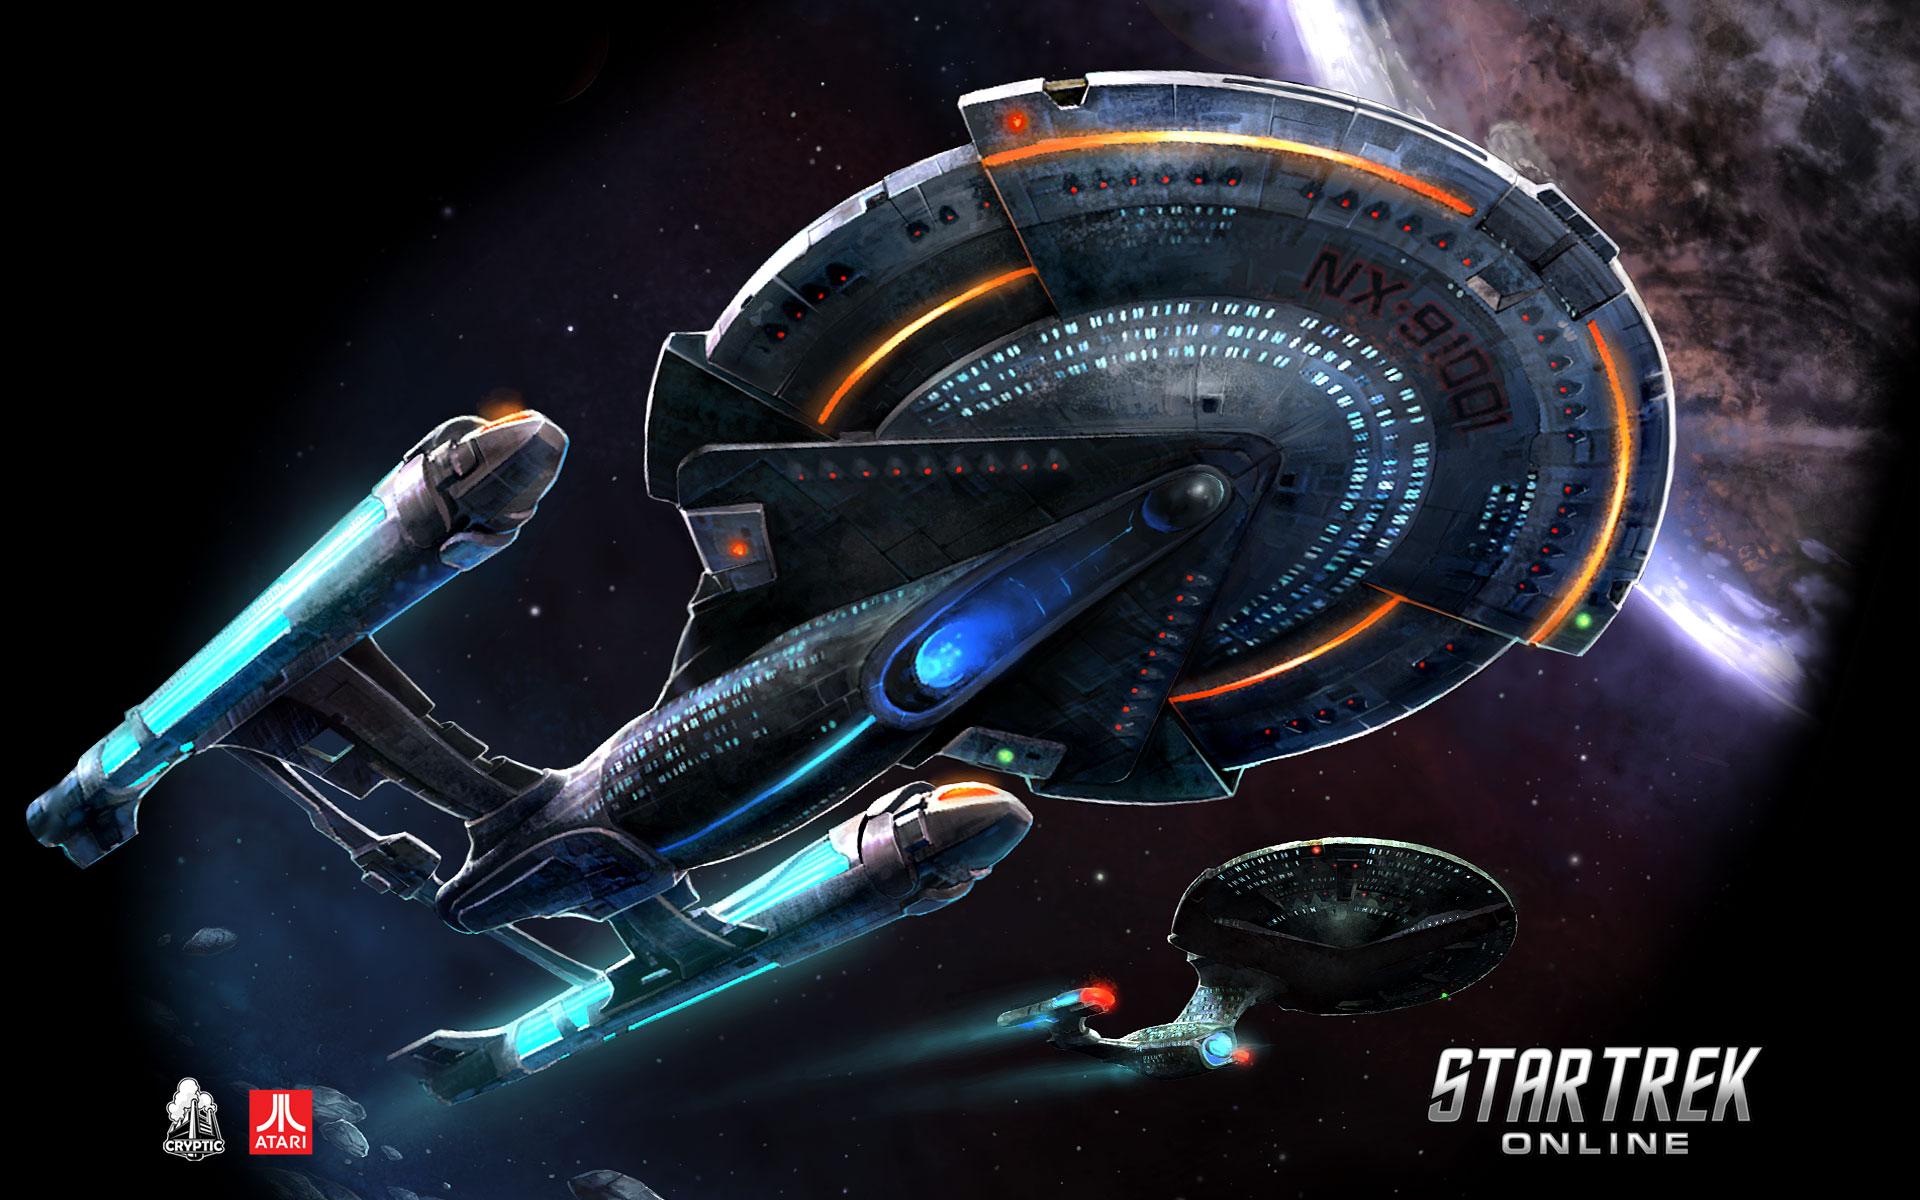 Star Trek Online wallpaper 113387 1920x1200